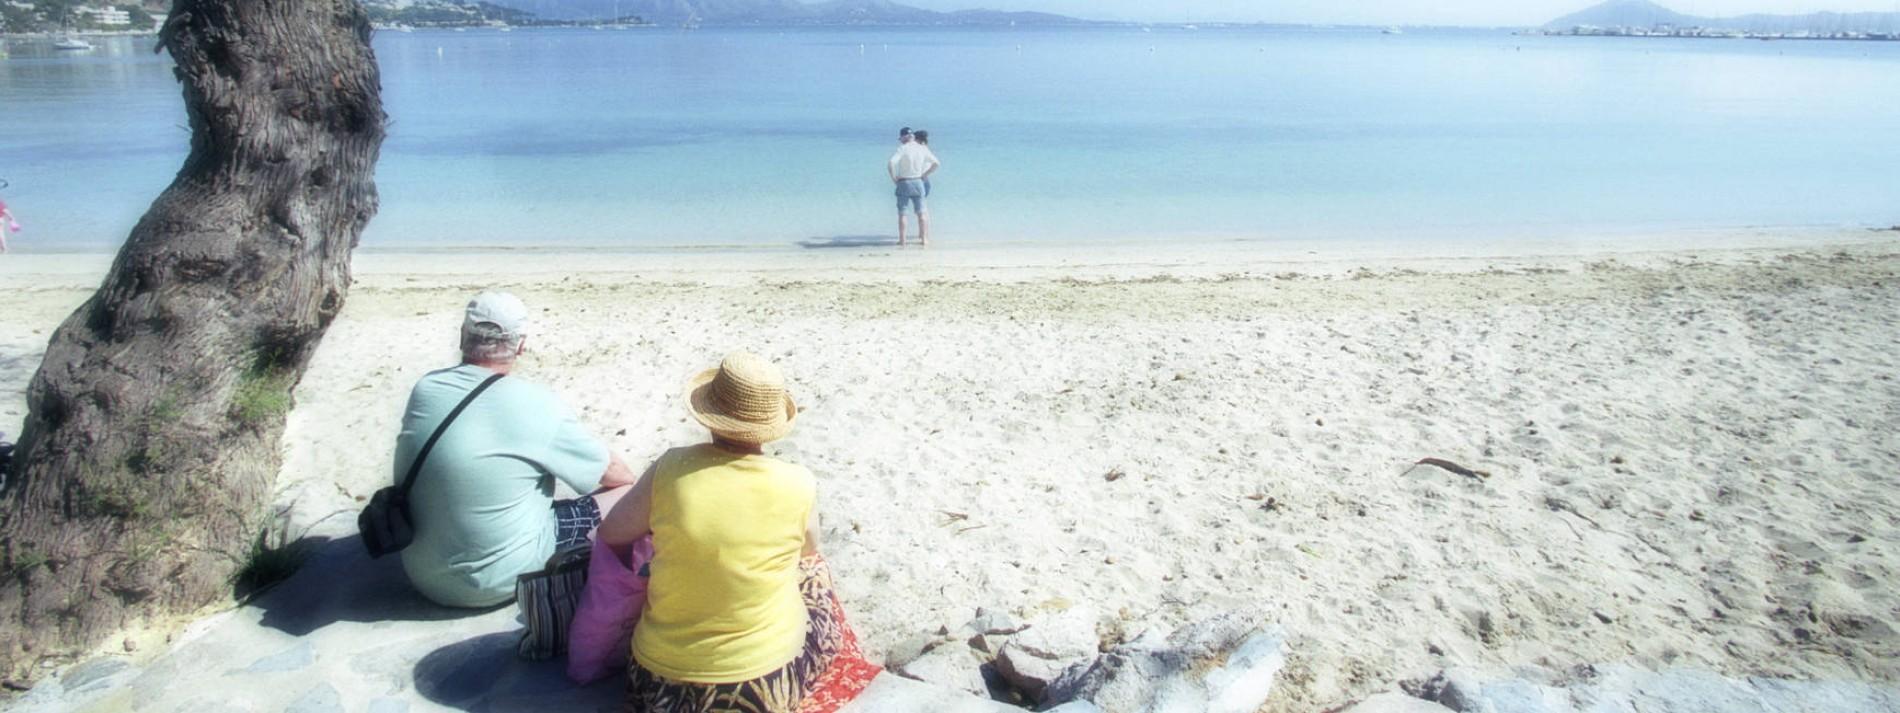 Auswandern Nach Mallorca Als Rentner - hana lasya